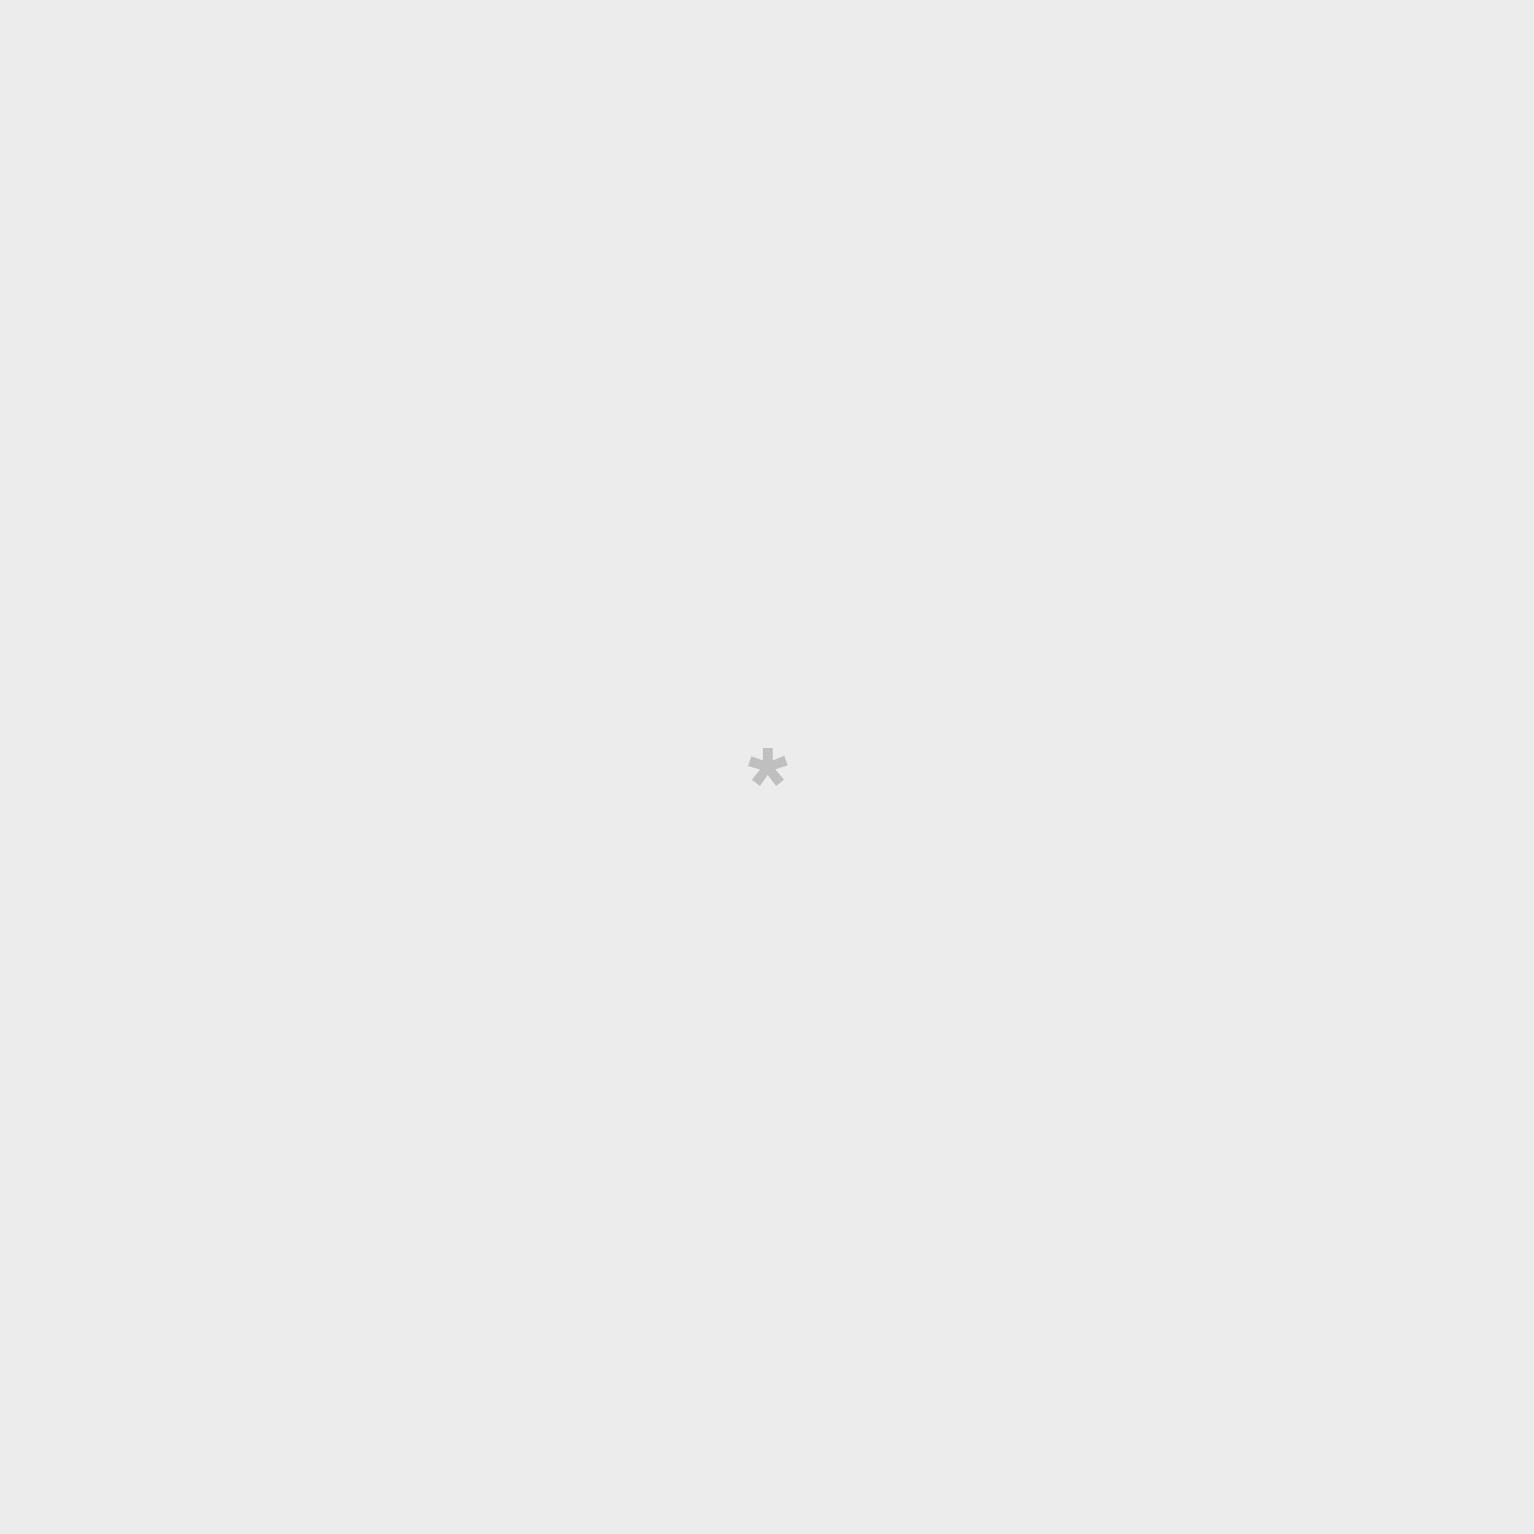 Kit para decorar tu agenda - Make today a brilliant day